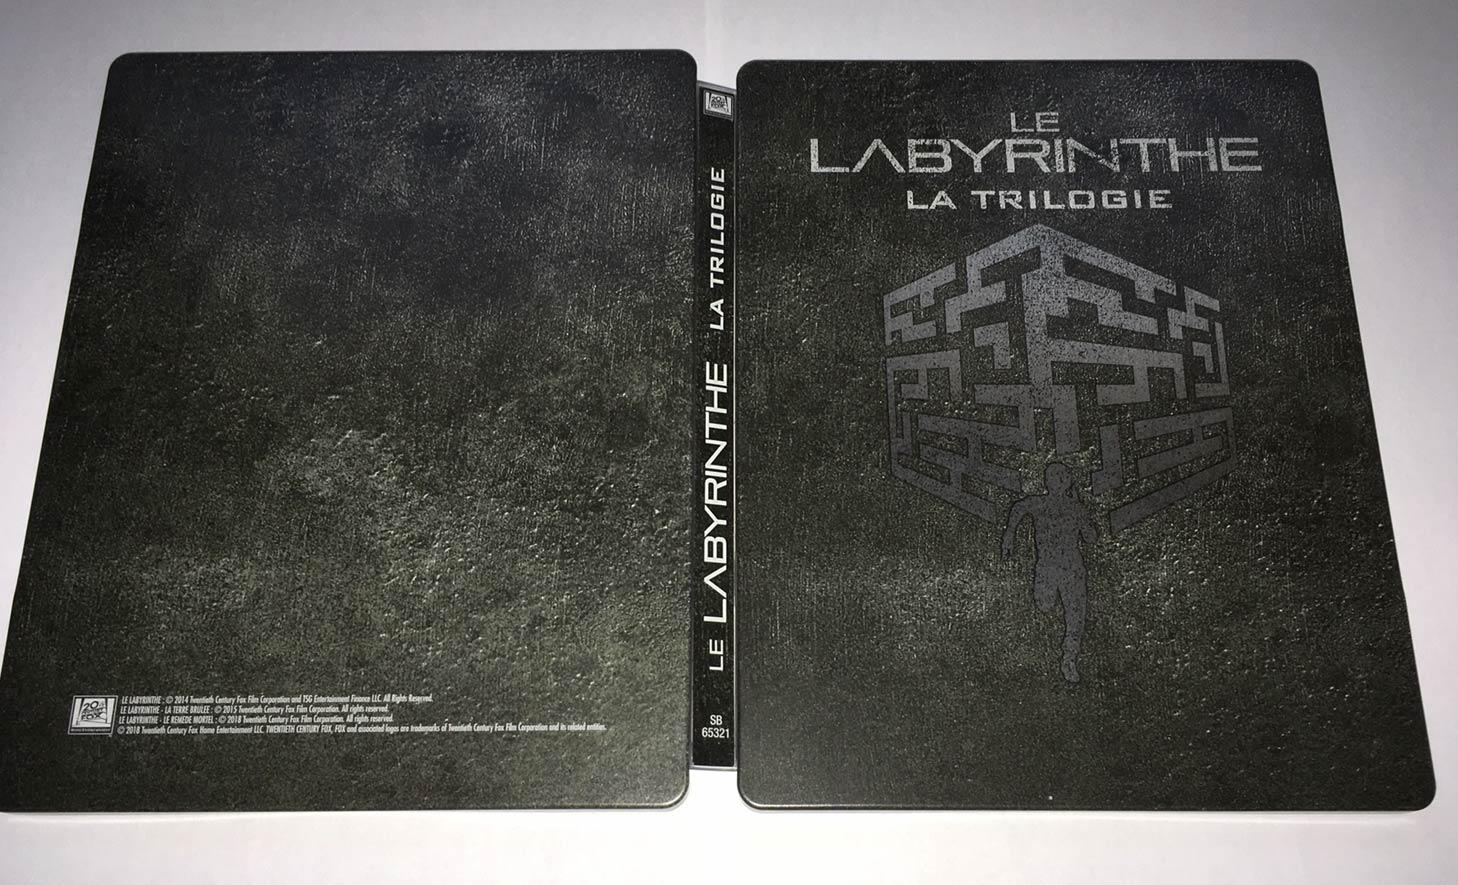 Labyrinthe-Trilogie-steelboo 2